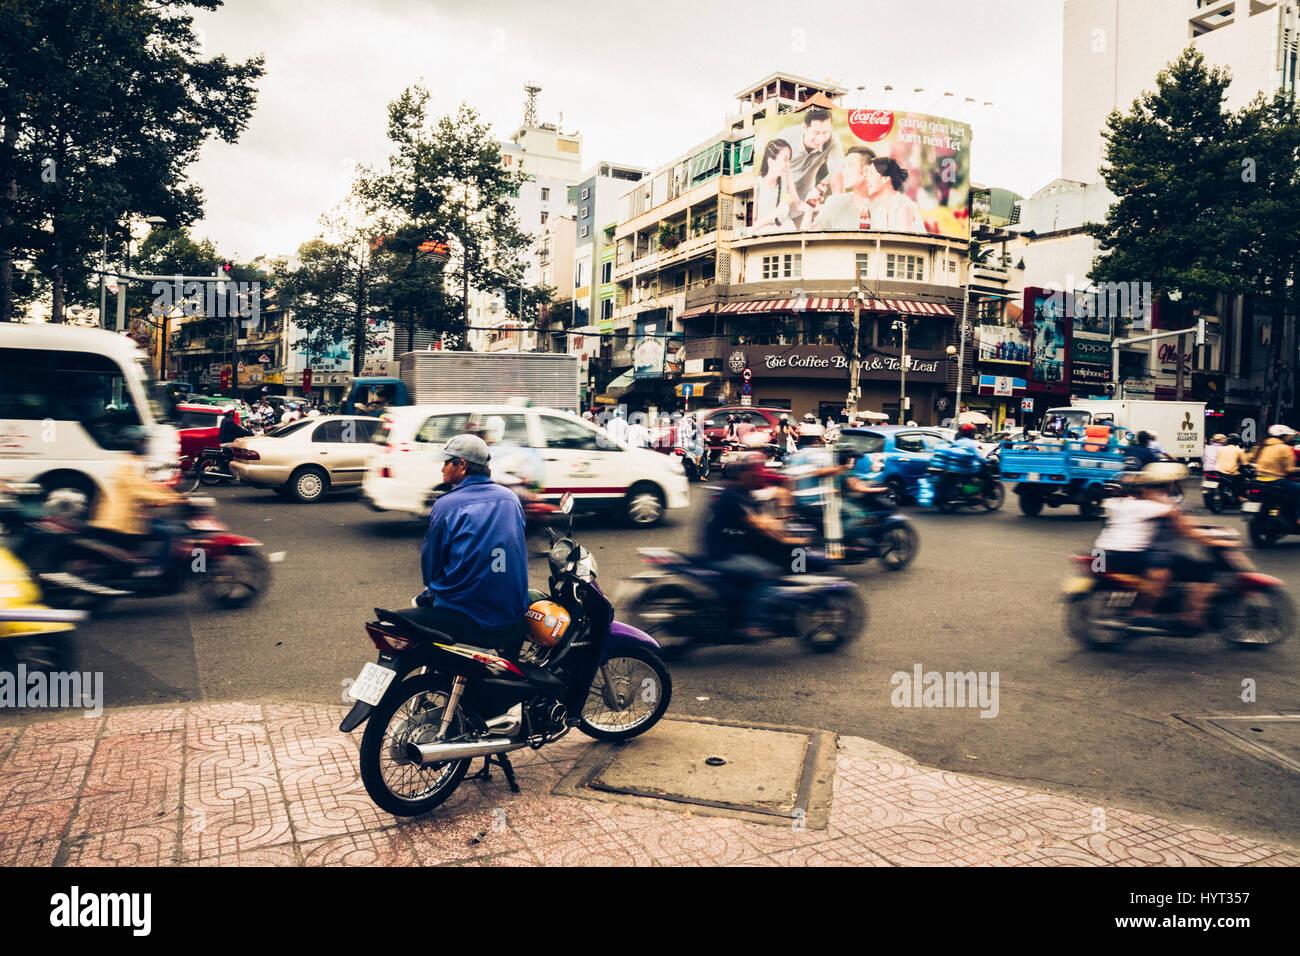 Watching Heavy Traffic In Saigon, Ho Chi Minh City, Vietnam - Stock Image